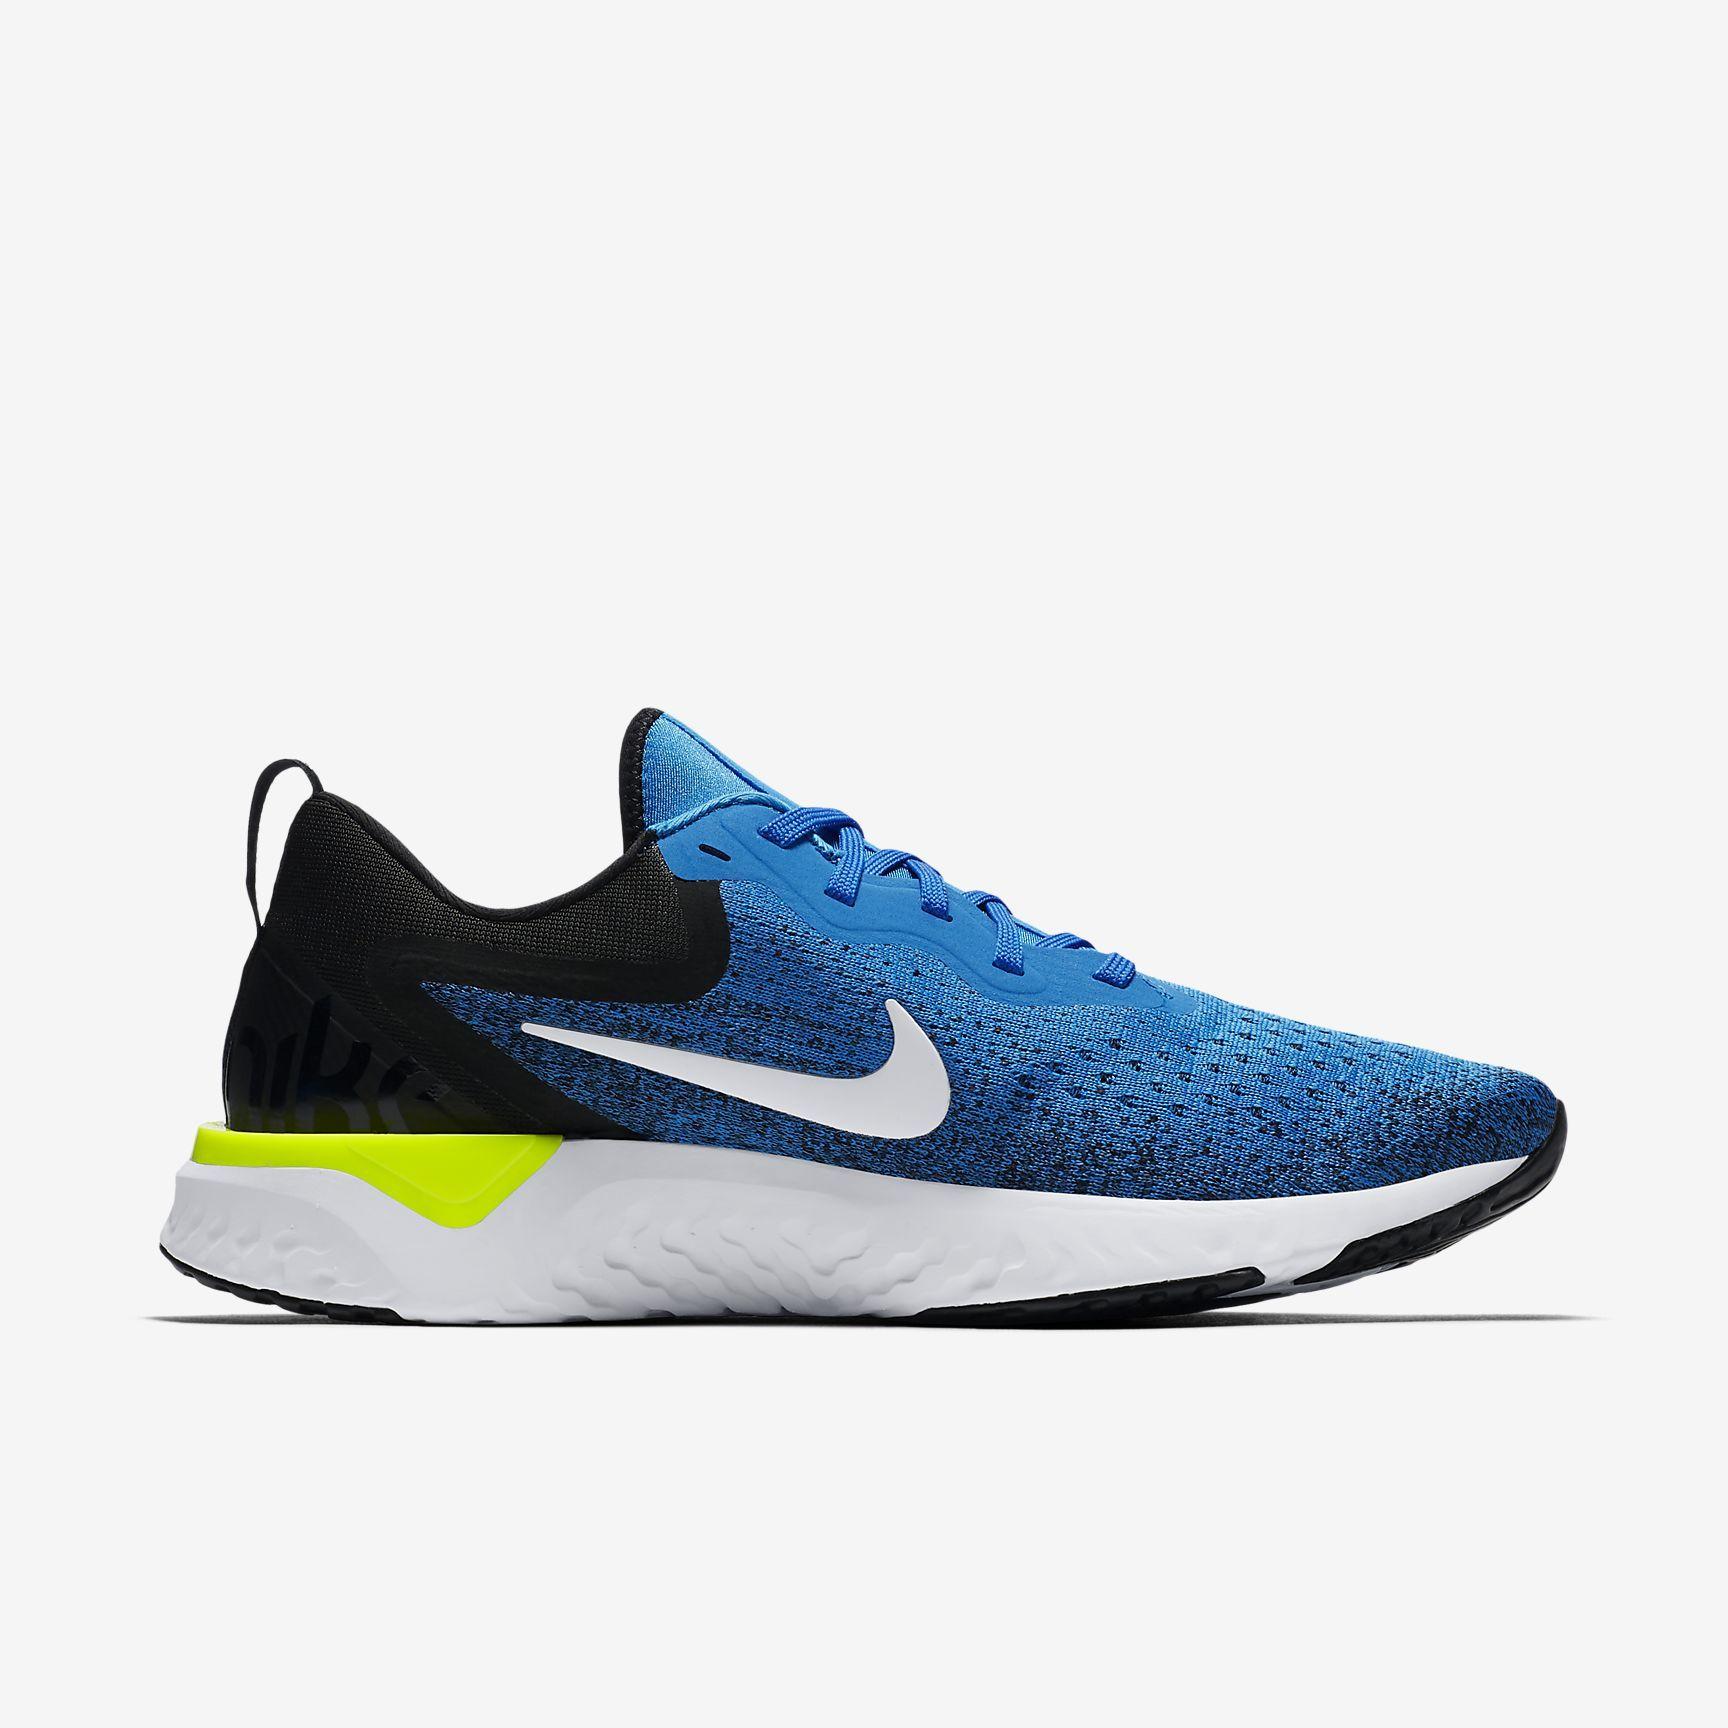 Nike Odyssey React in Blau Weiß